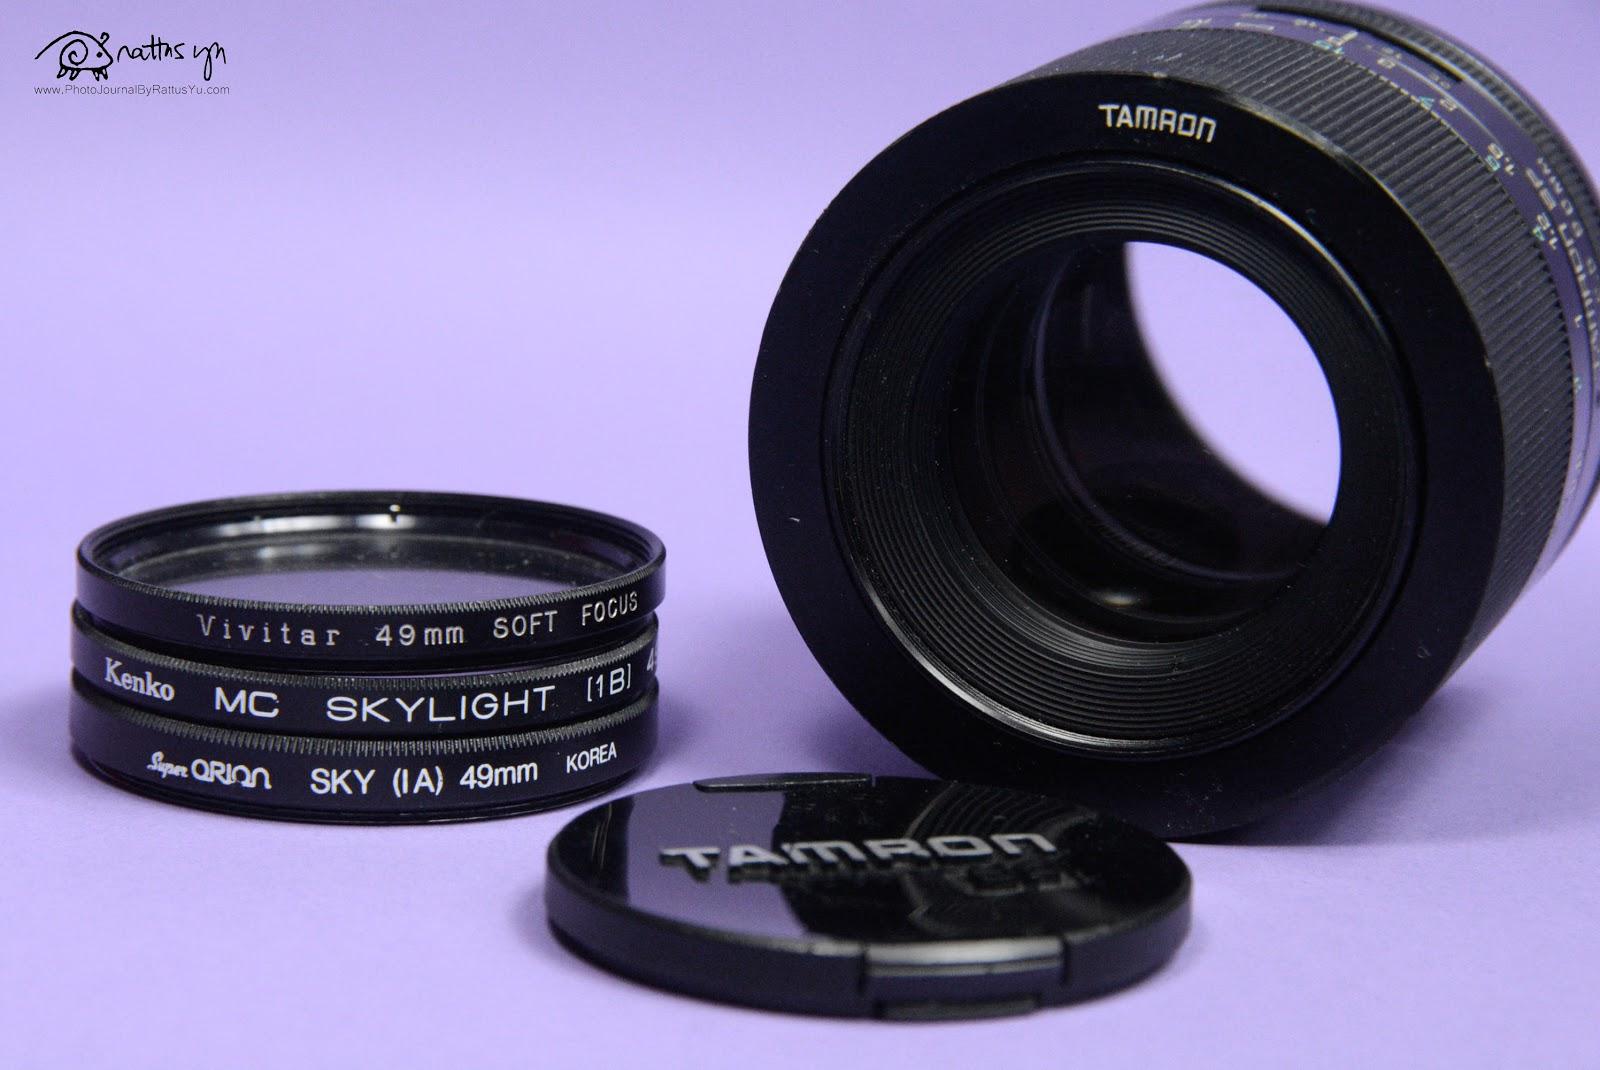 Tamron Adaptall 2 SP 90mm f/2.5 Macro (52B)